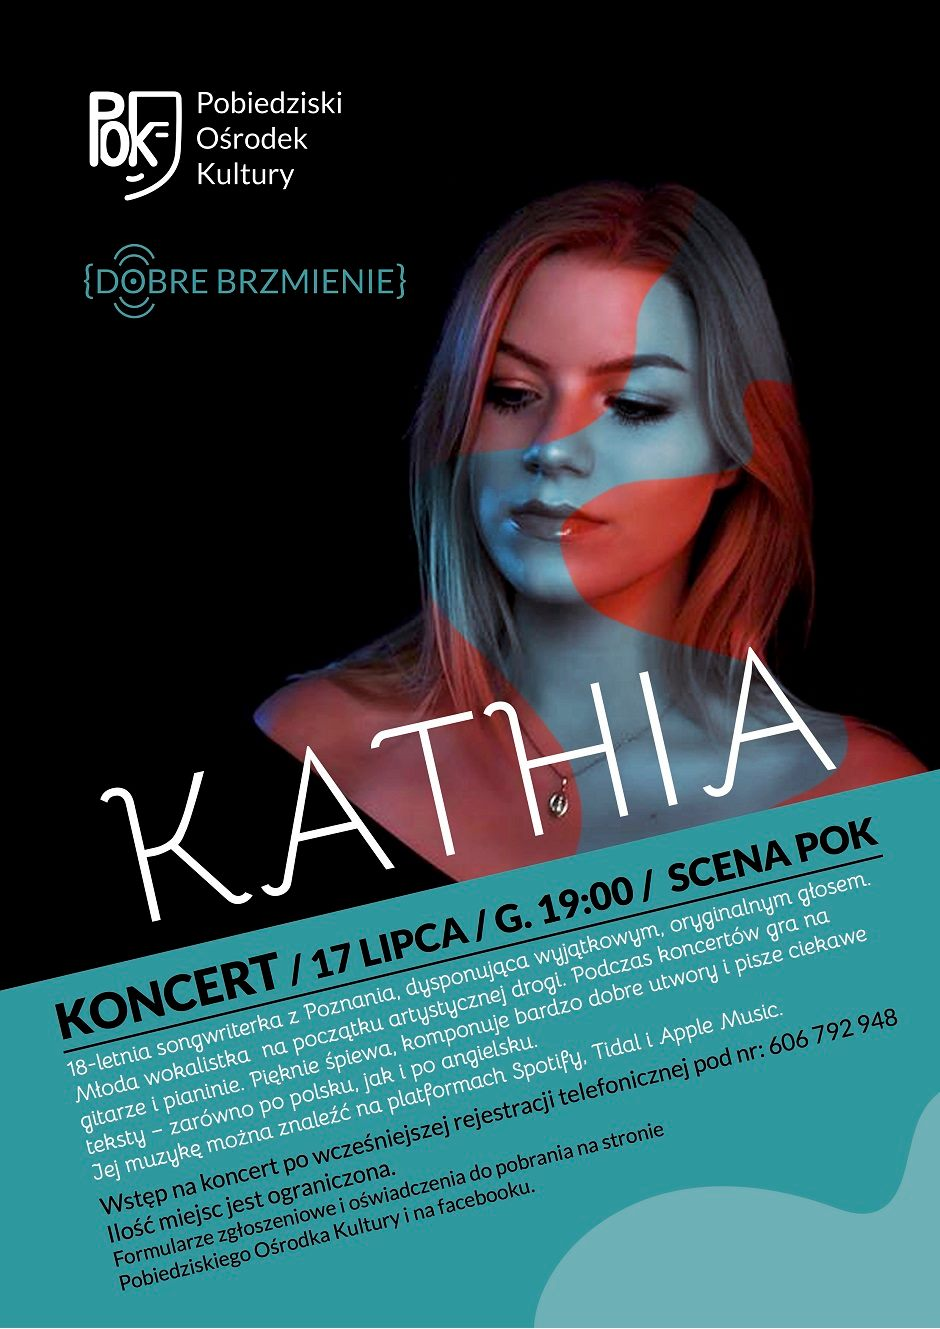 Koncert KATHIA